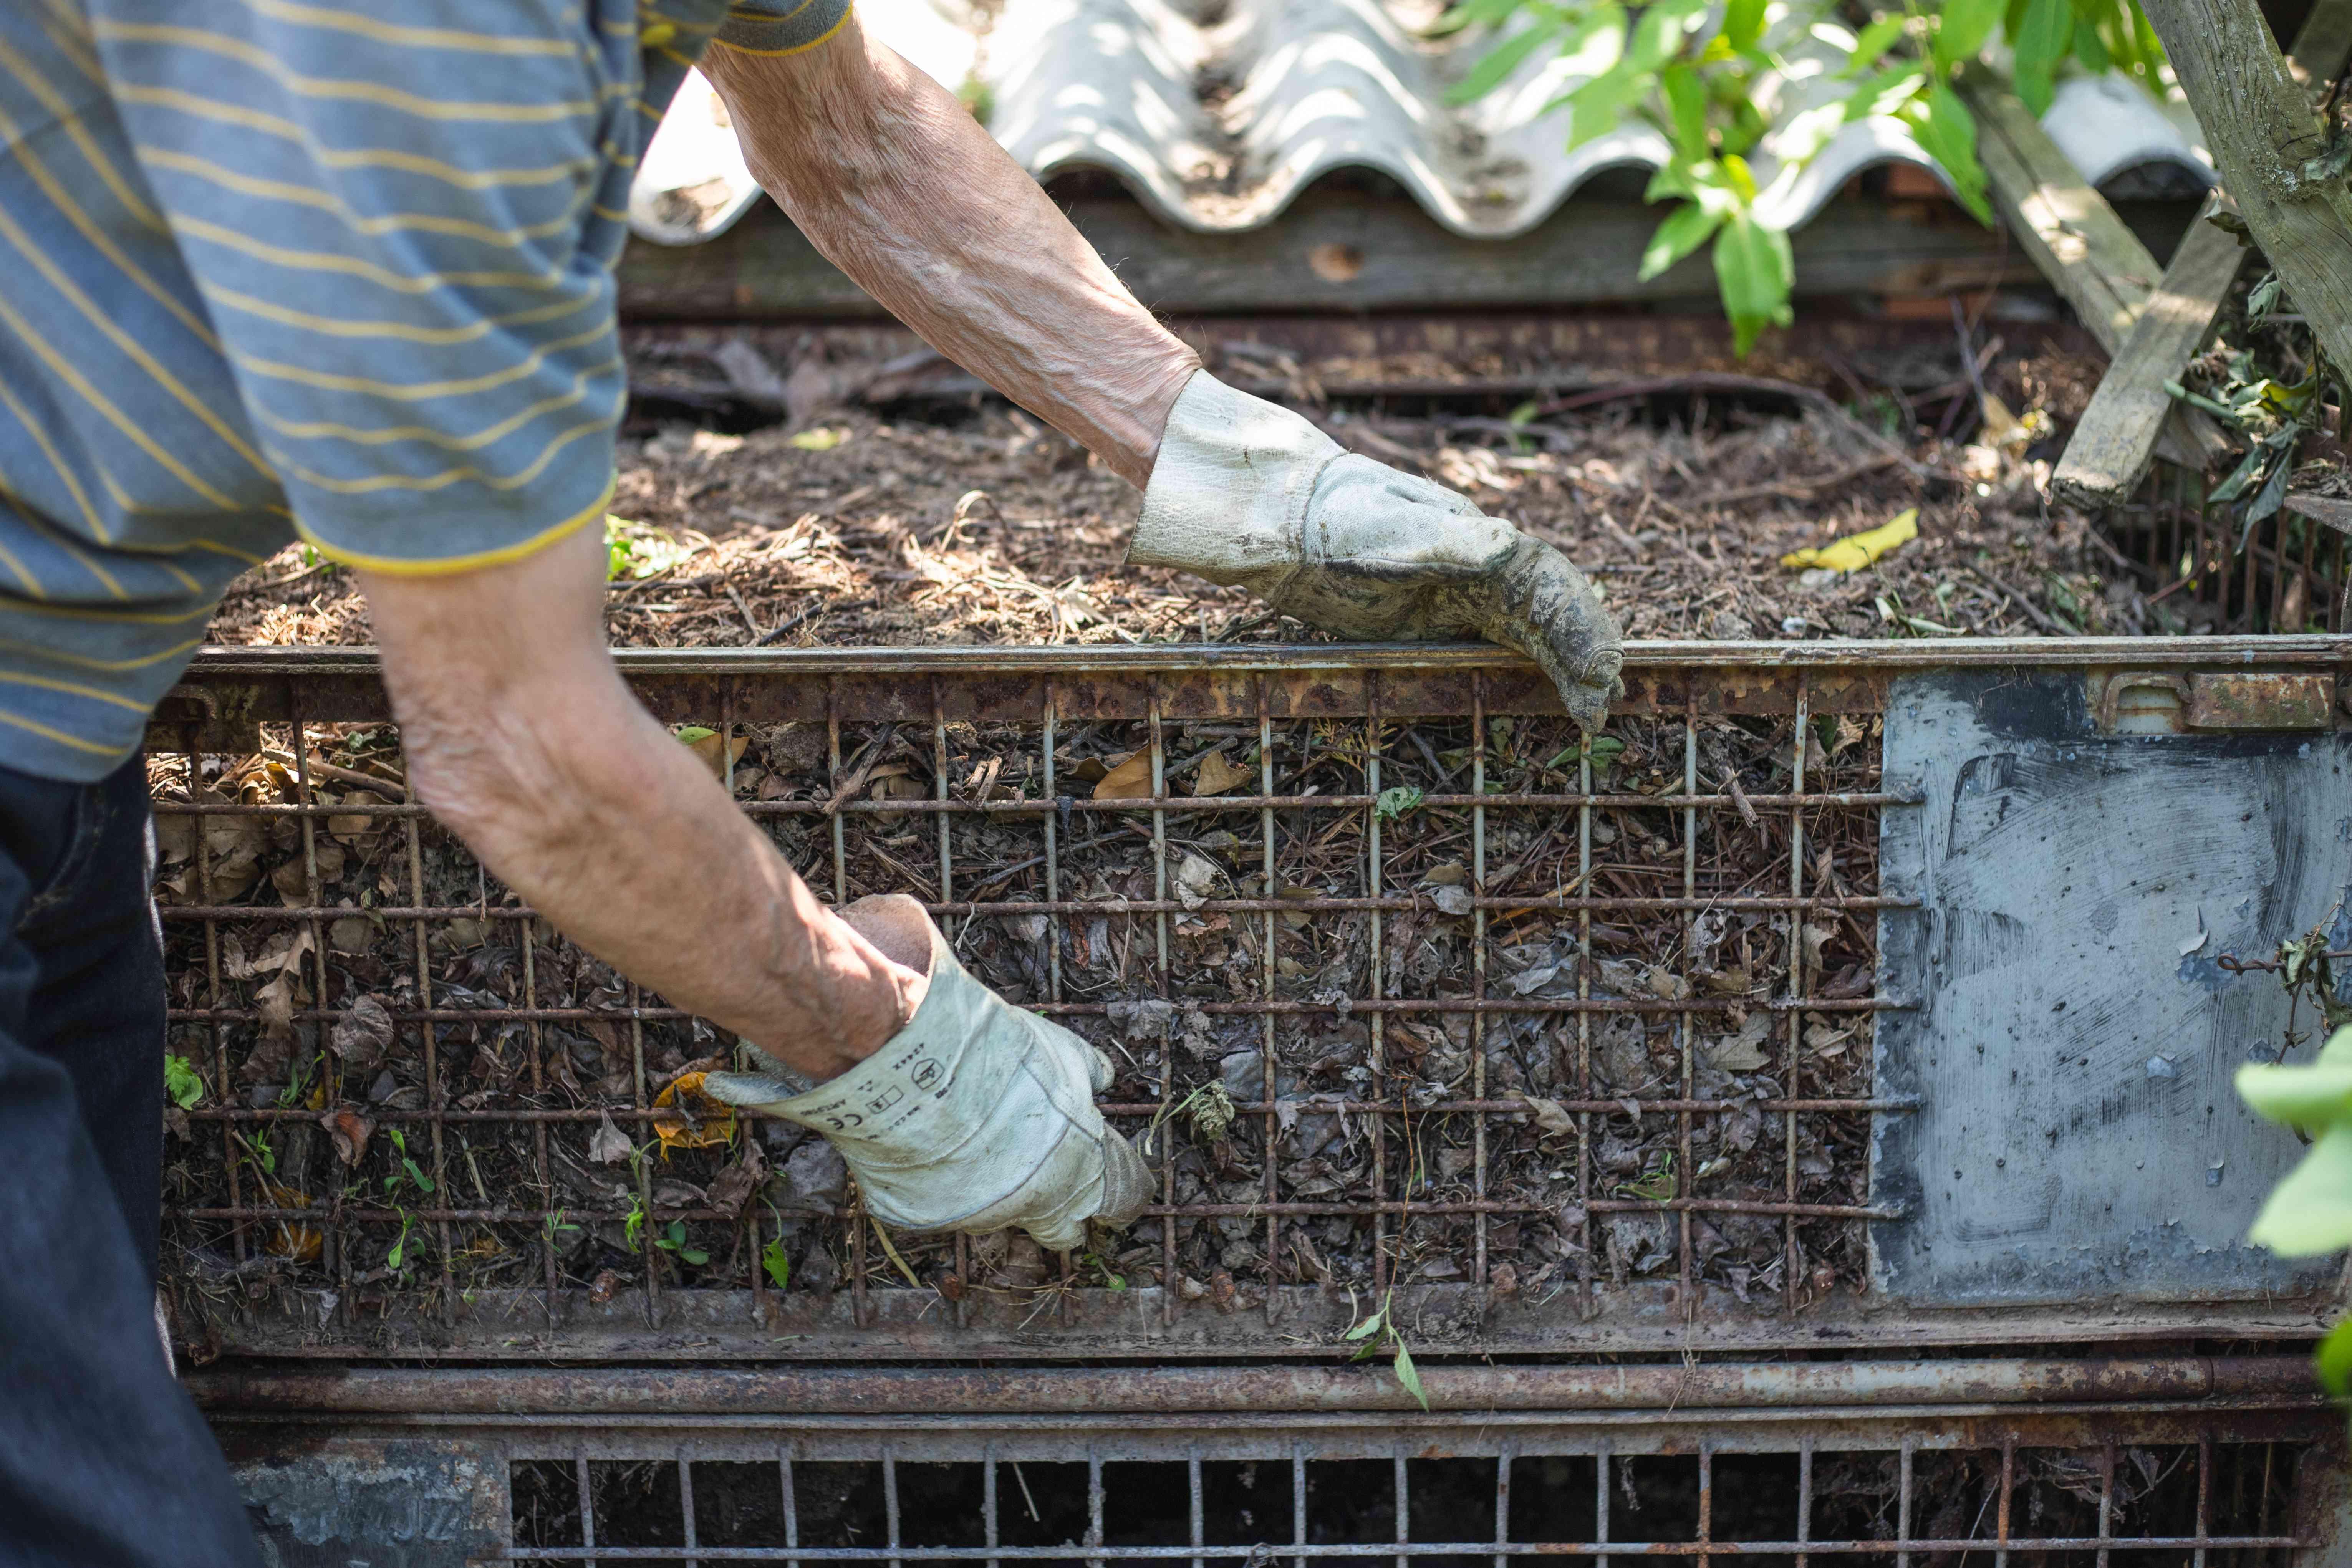 older person with garden gloves adjusts outdoor metal compost bin